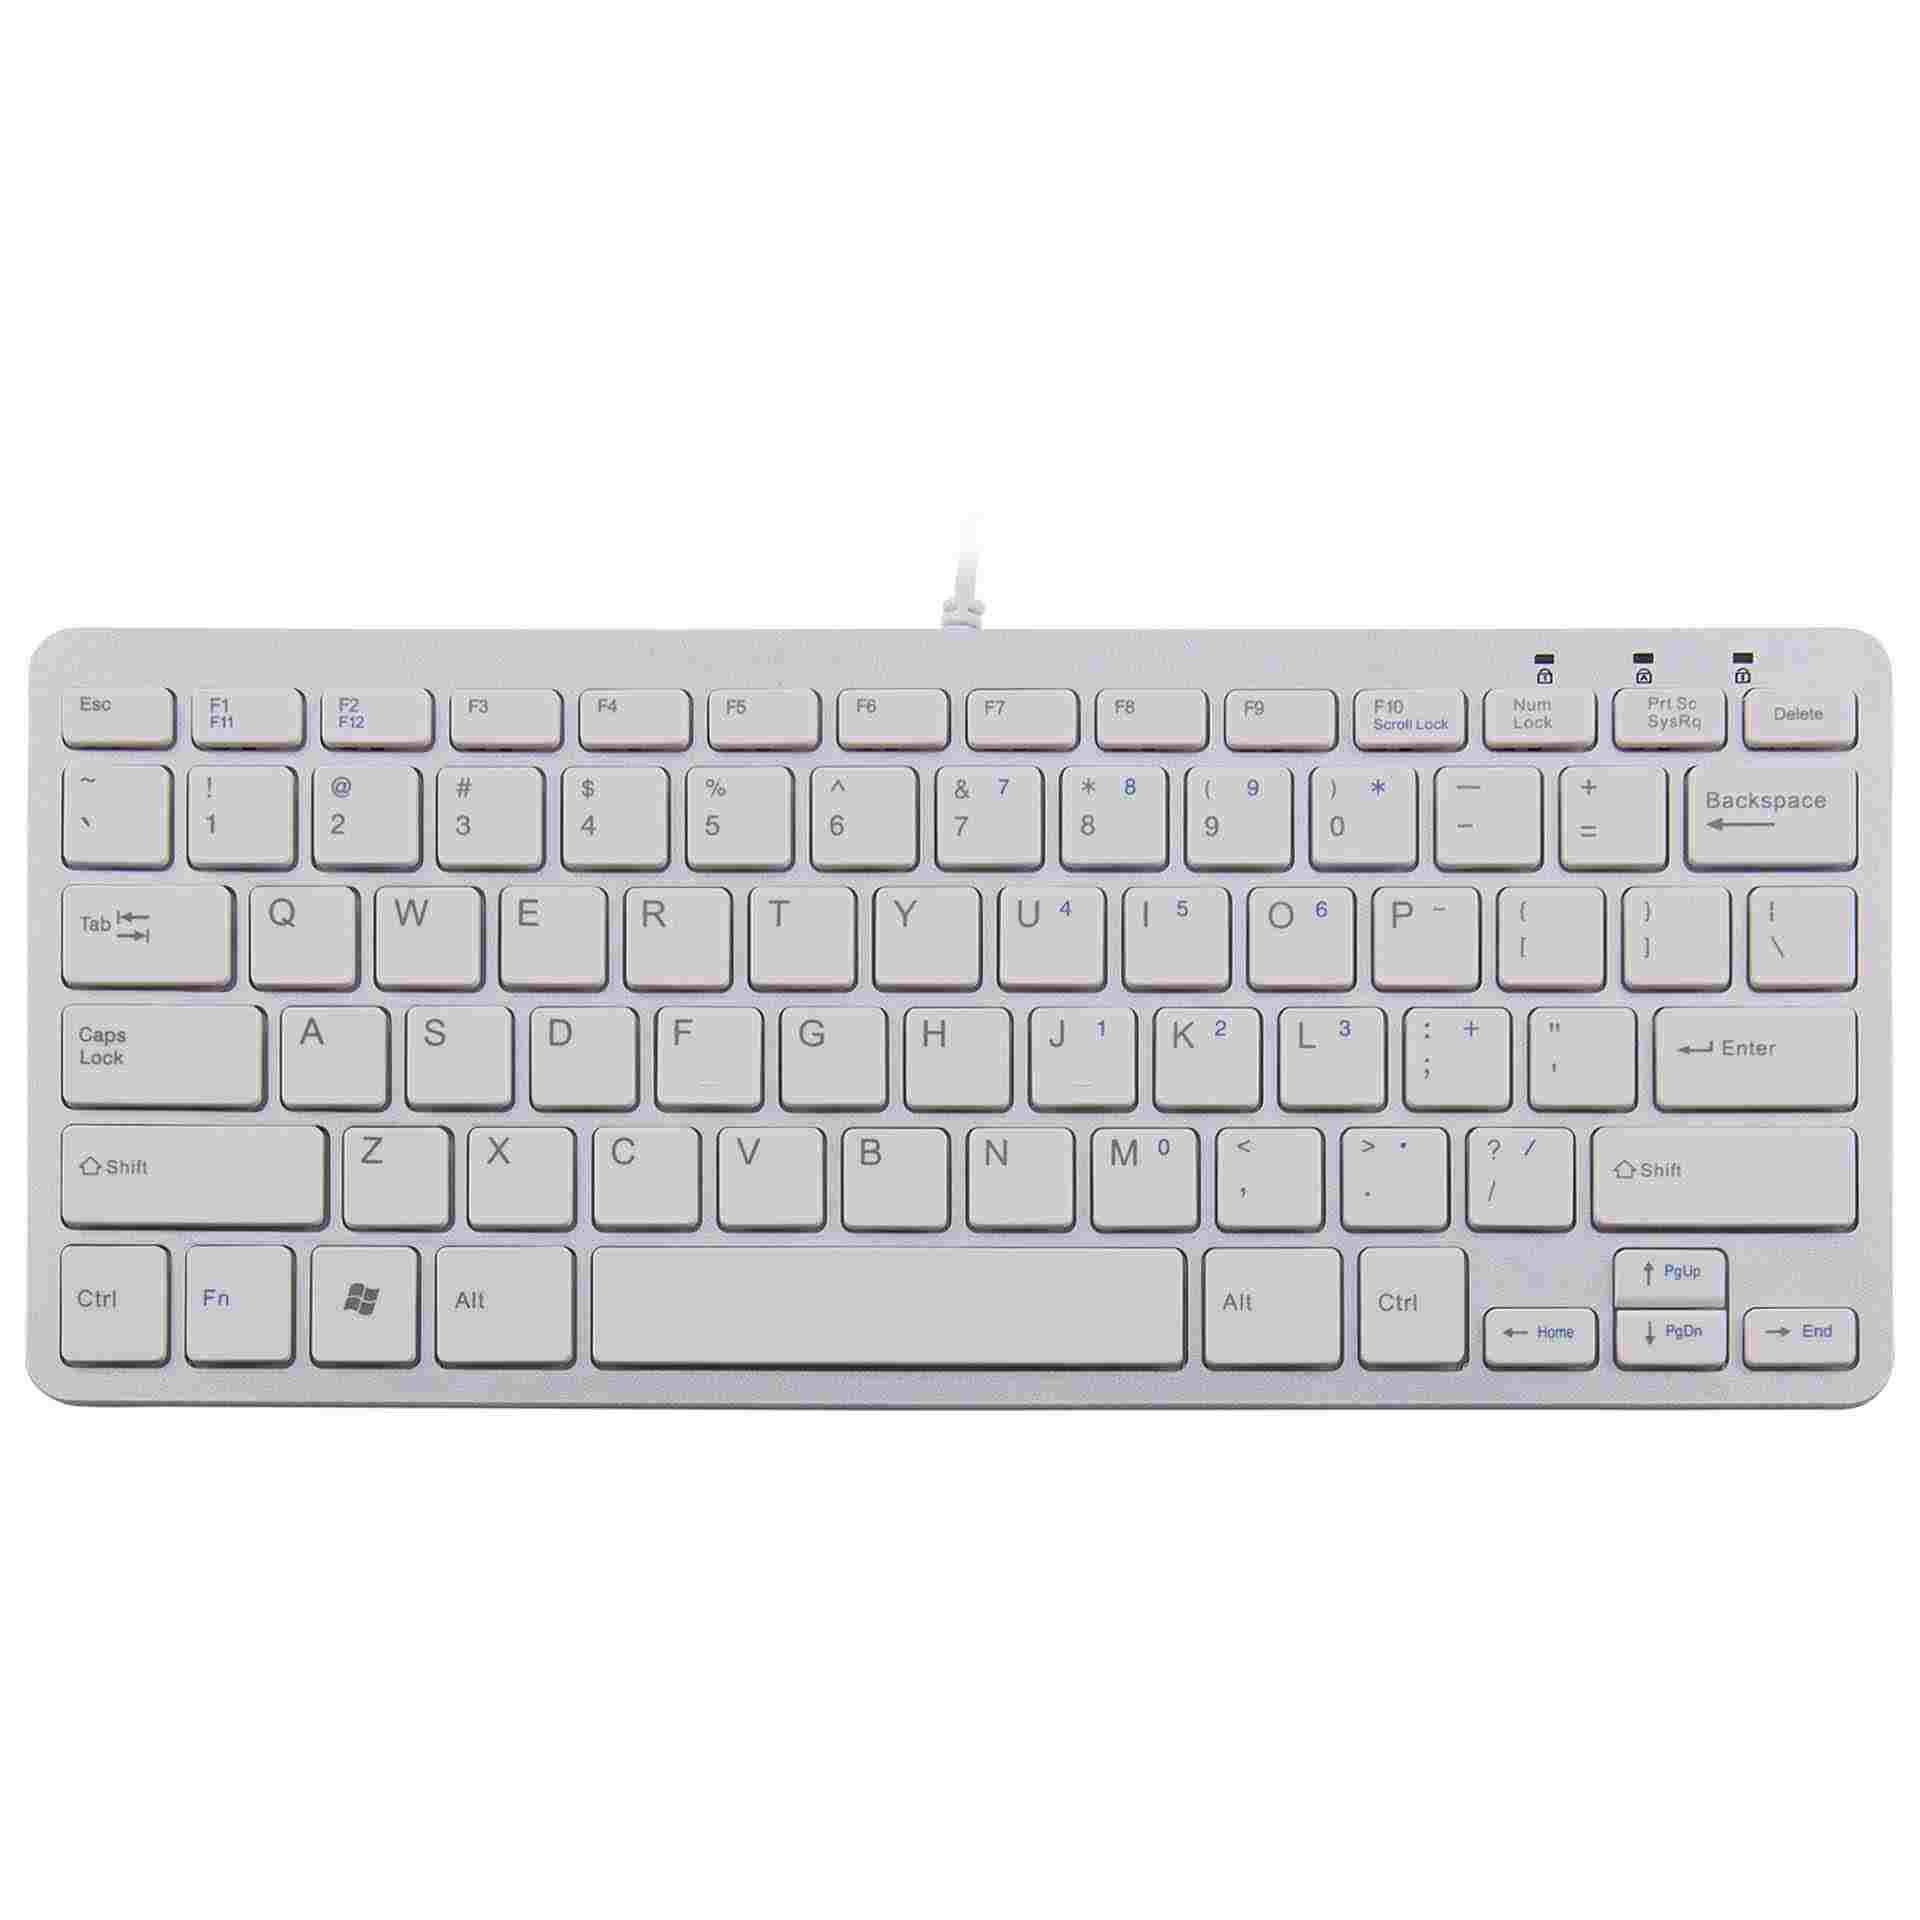 Ergostars compact keyboard wit